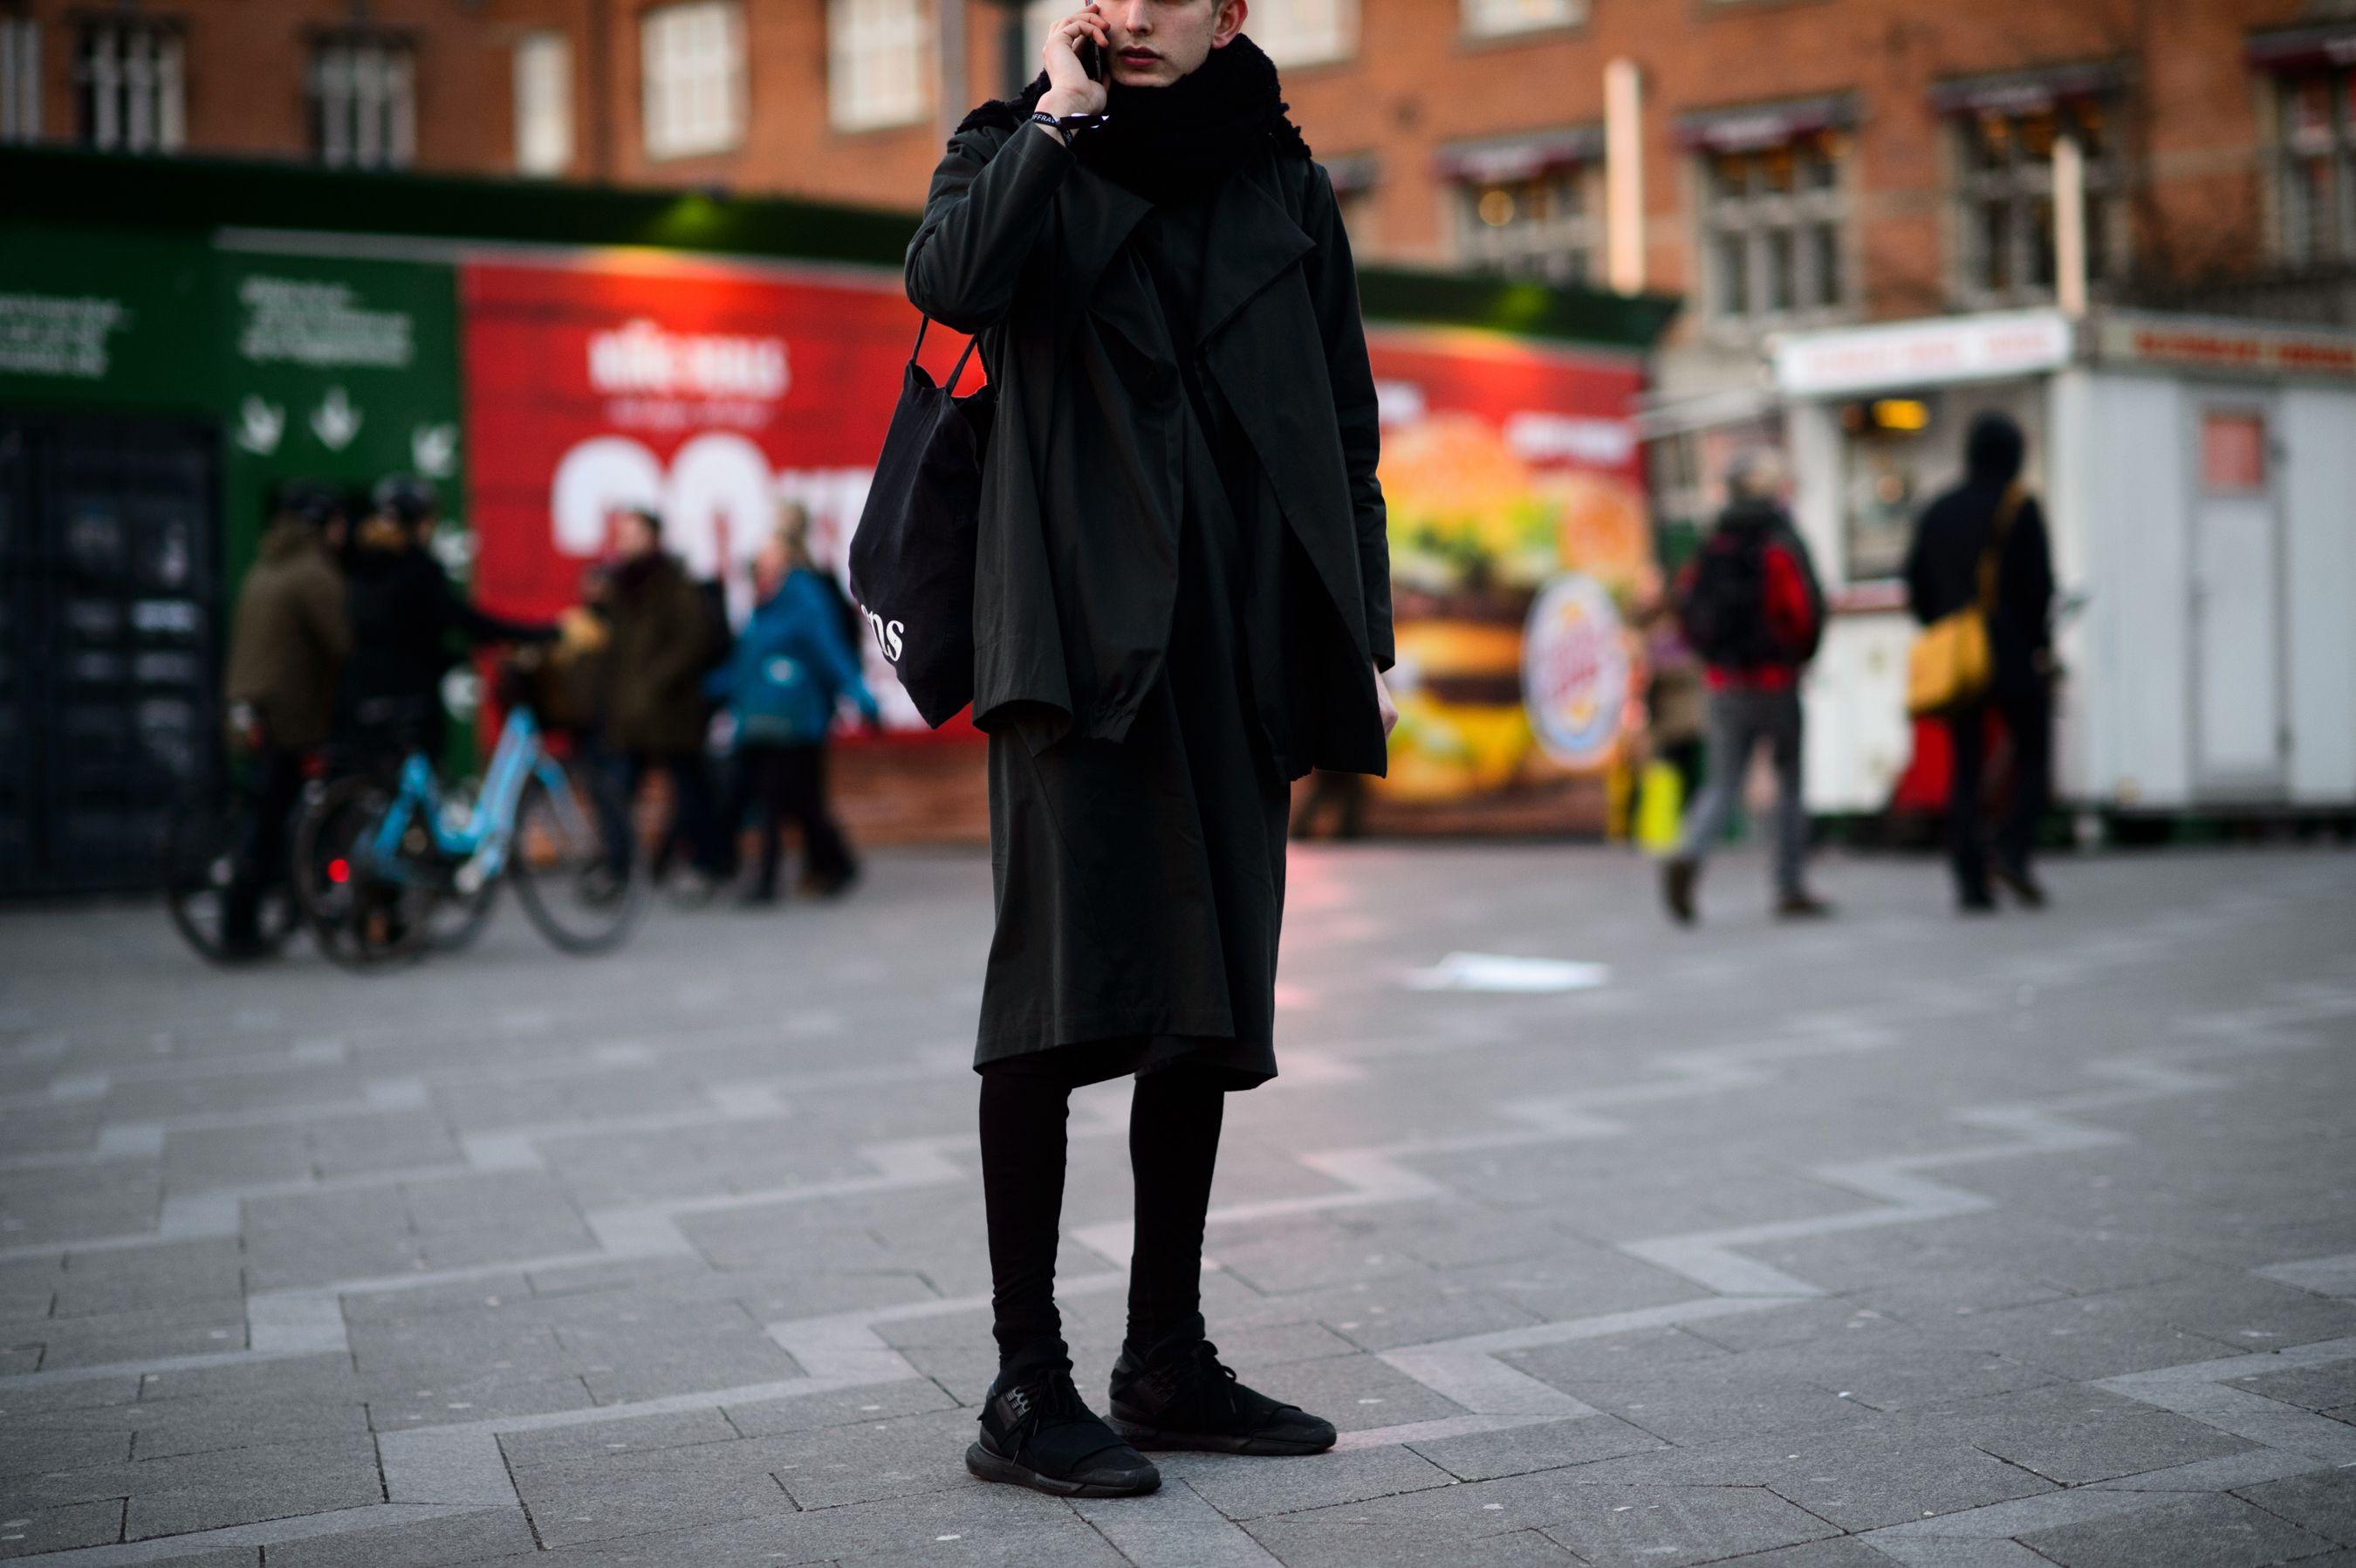 Le 21ème / Rådhuspladsen   Copenhagen  // #Fashion, #FashionBlog, #FashionBlogger, #Ootd, #OutfitOfTheDay, #StreetStyle, #Style